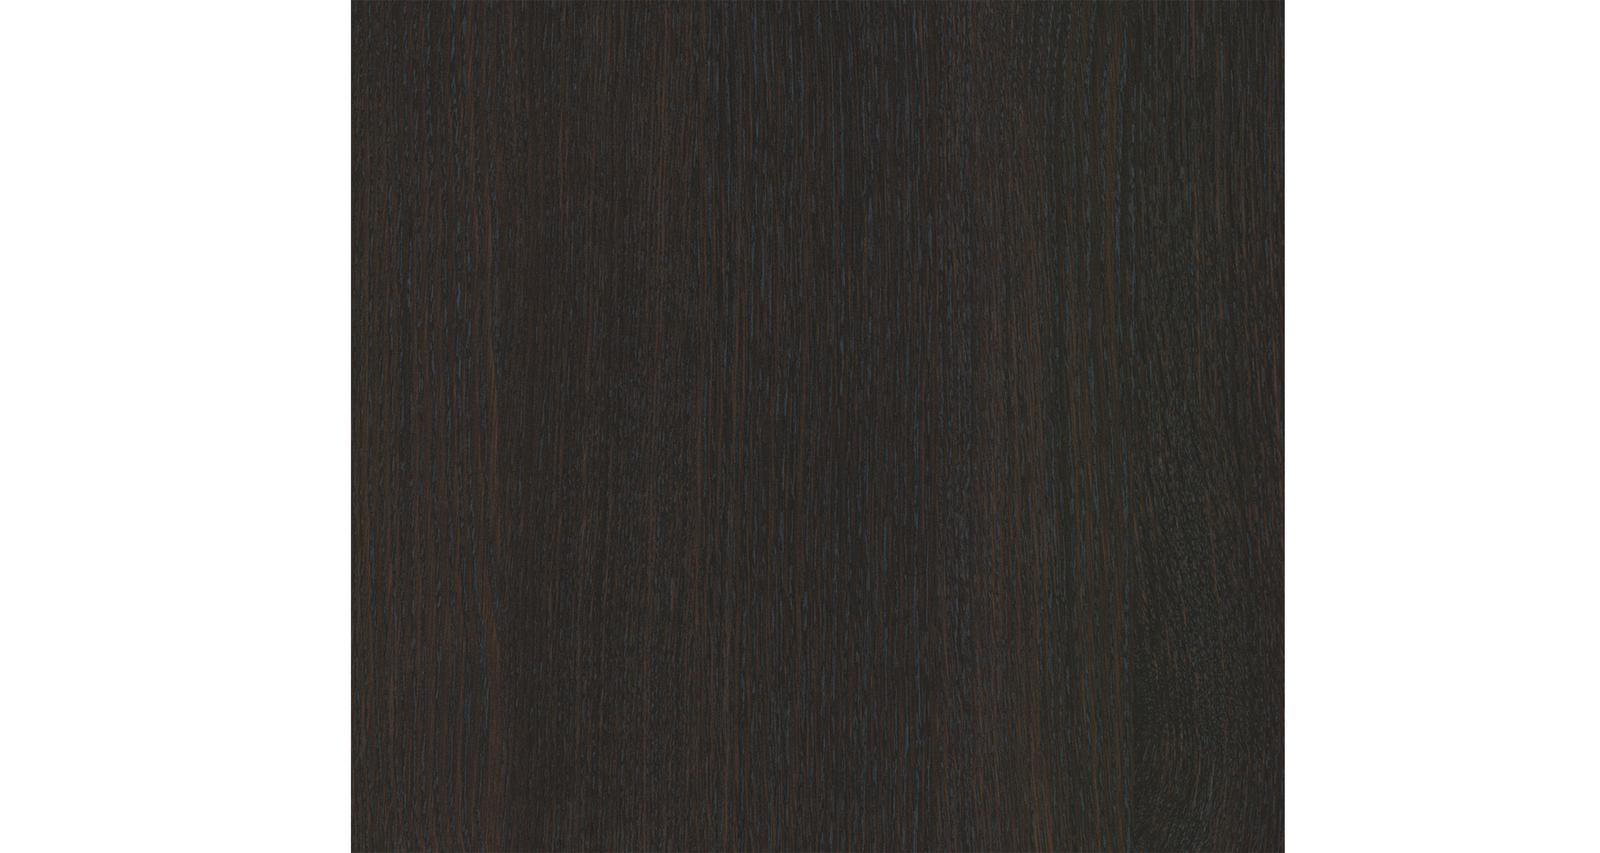 Шкаф-купе двухдверный Манчестер 150 см (дуб феррара+зеркало)